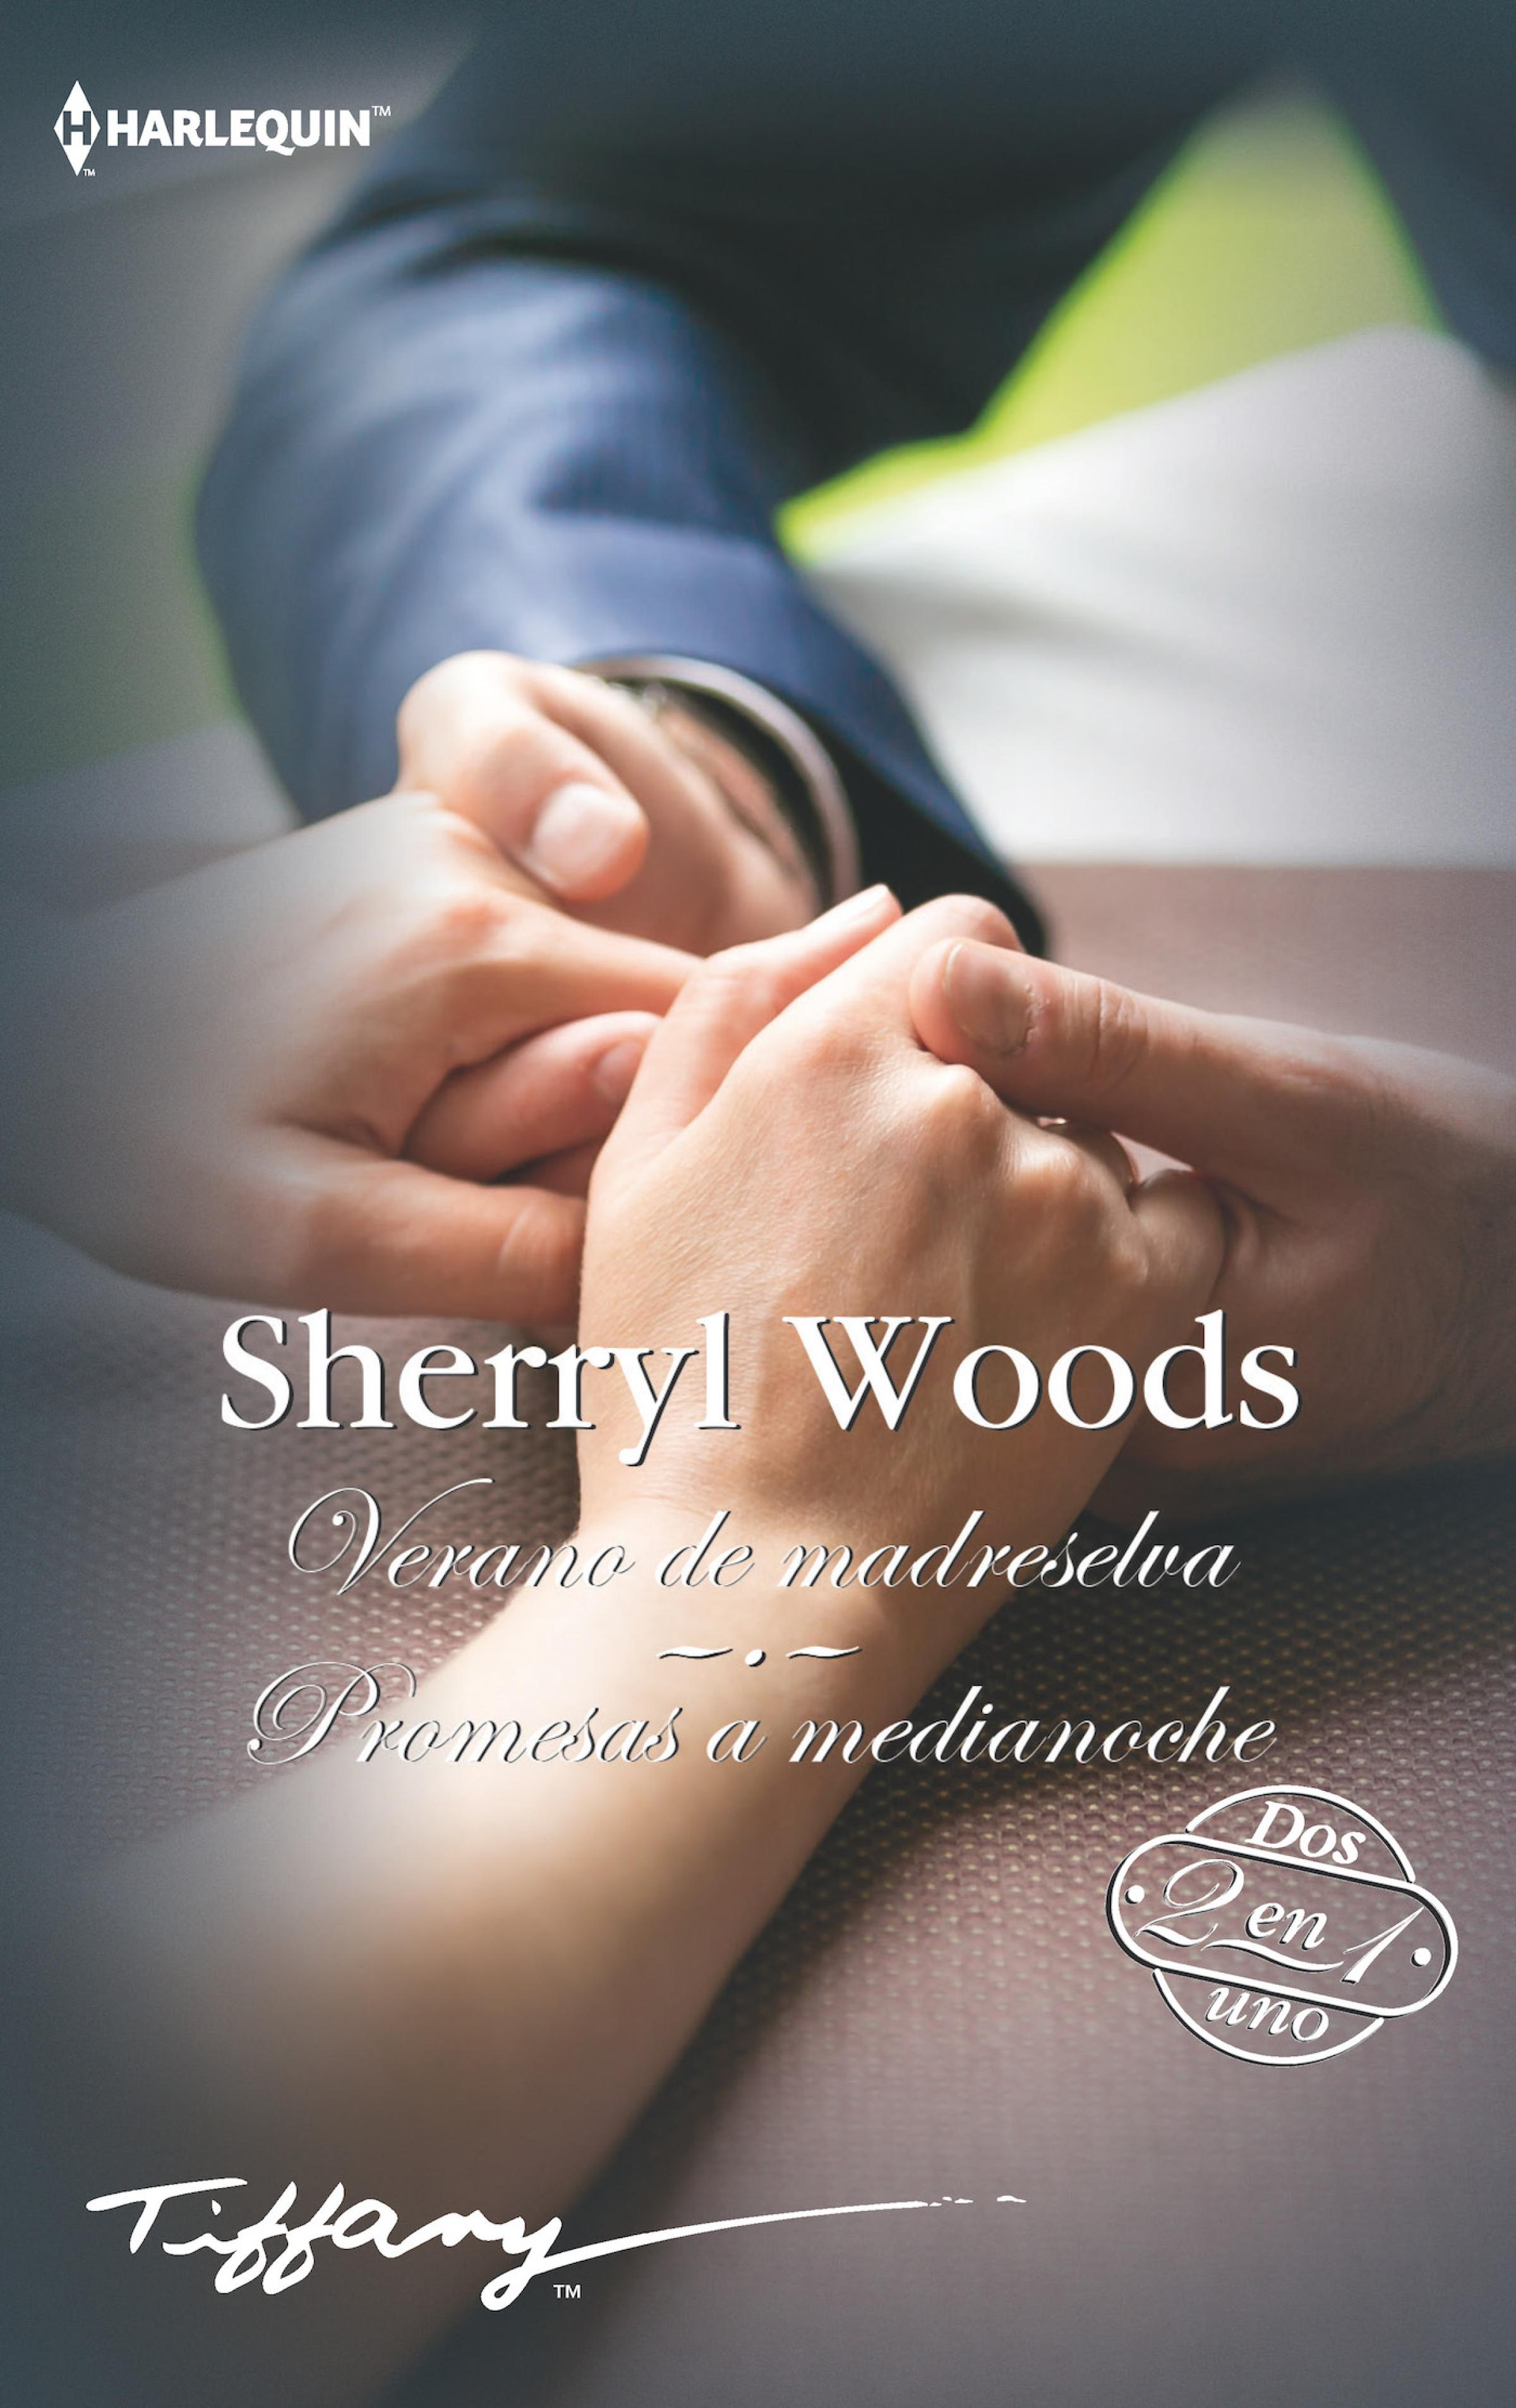 Sherryl Woods Verano de madreselva - Promesas a medianoche цена 2017